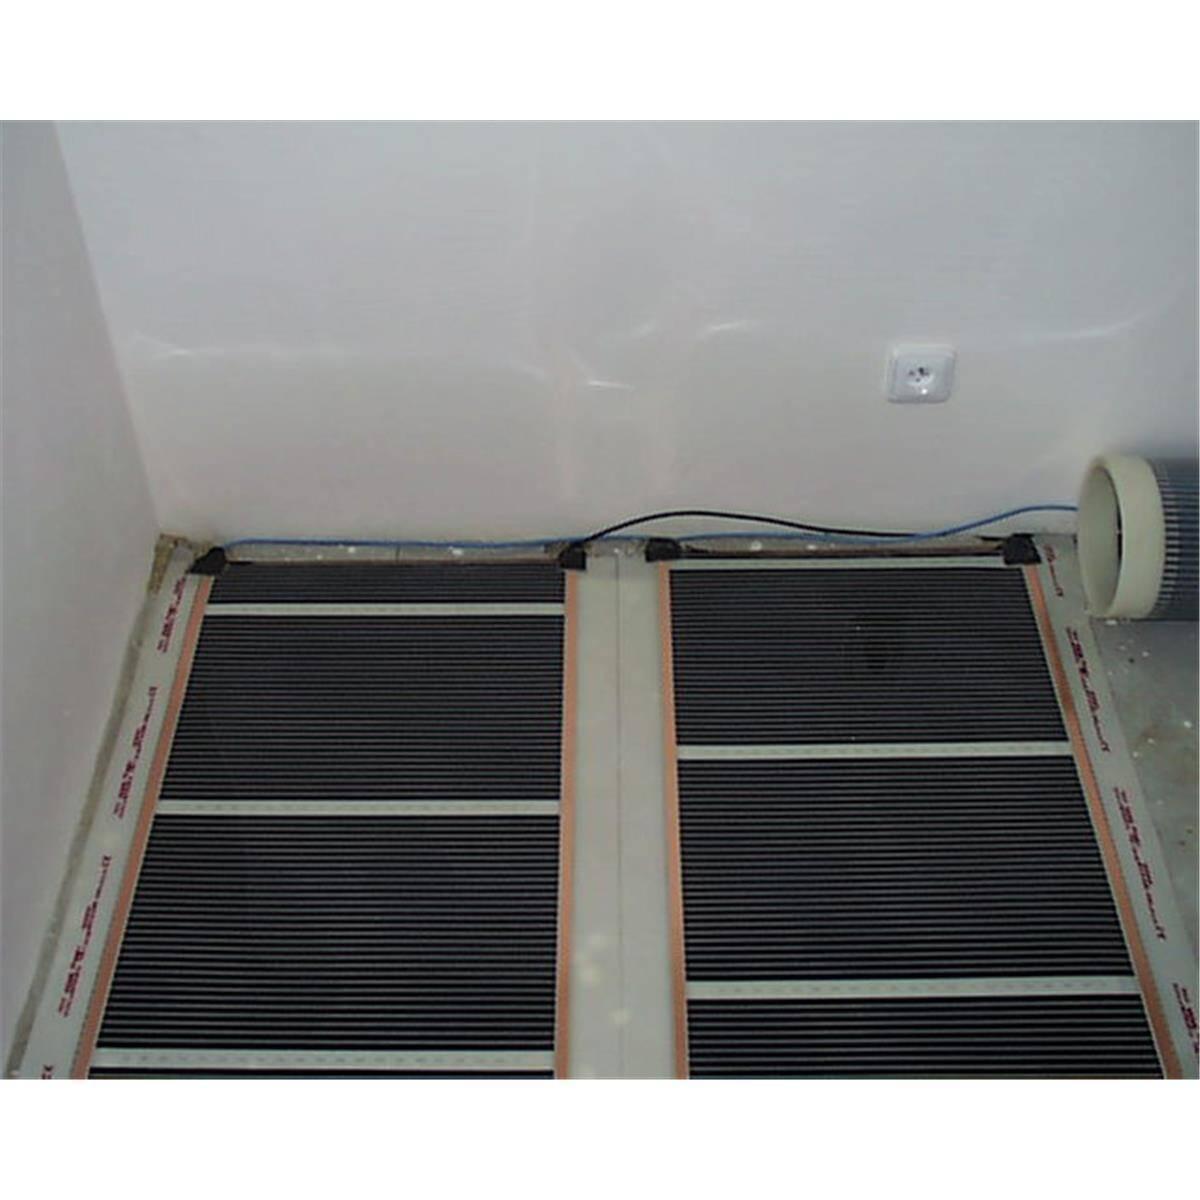 rollenware elektrische fu bodenheizfolie ecofilm f 80 w qm. Black Bedroom Furniture Sets. Home Design Ideas